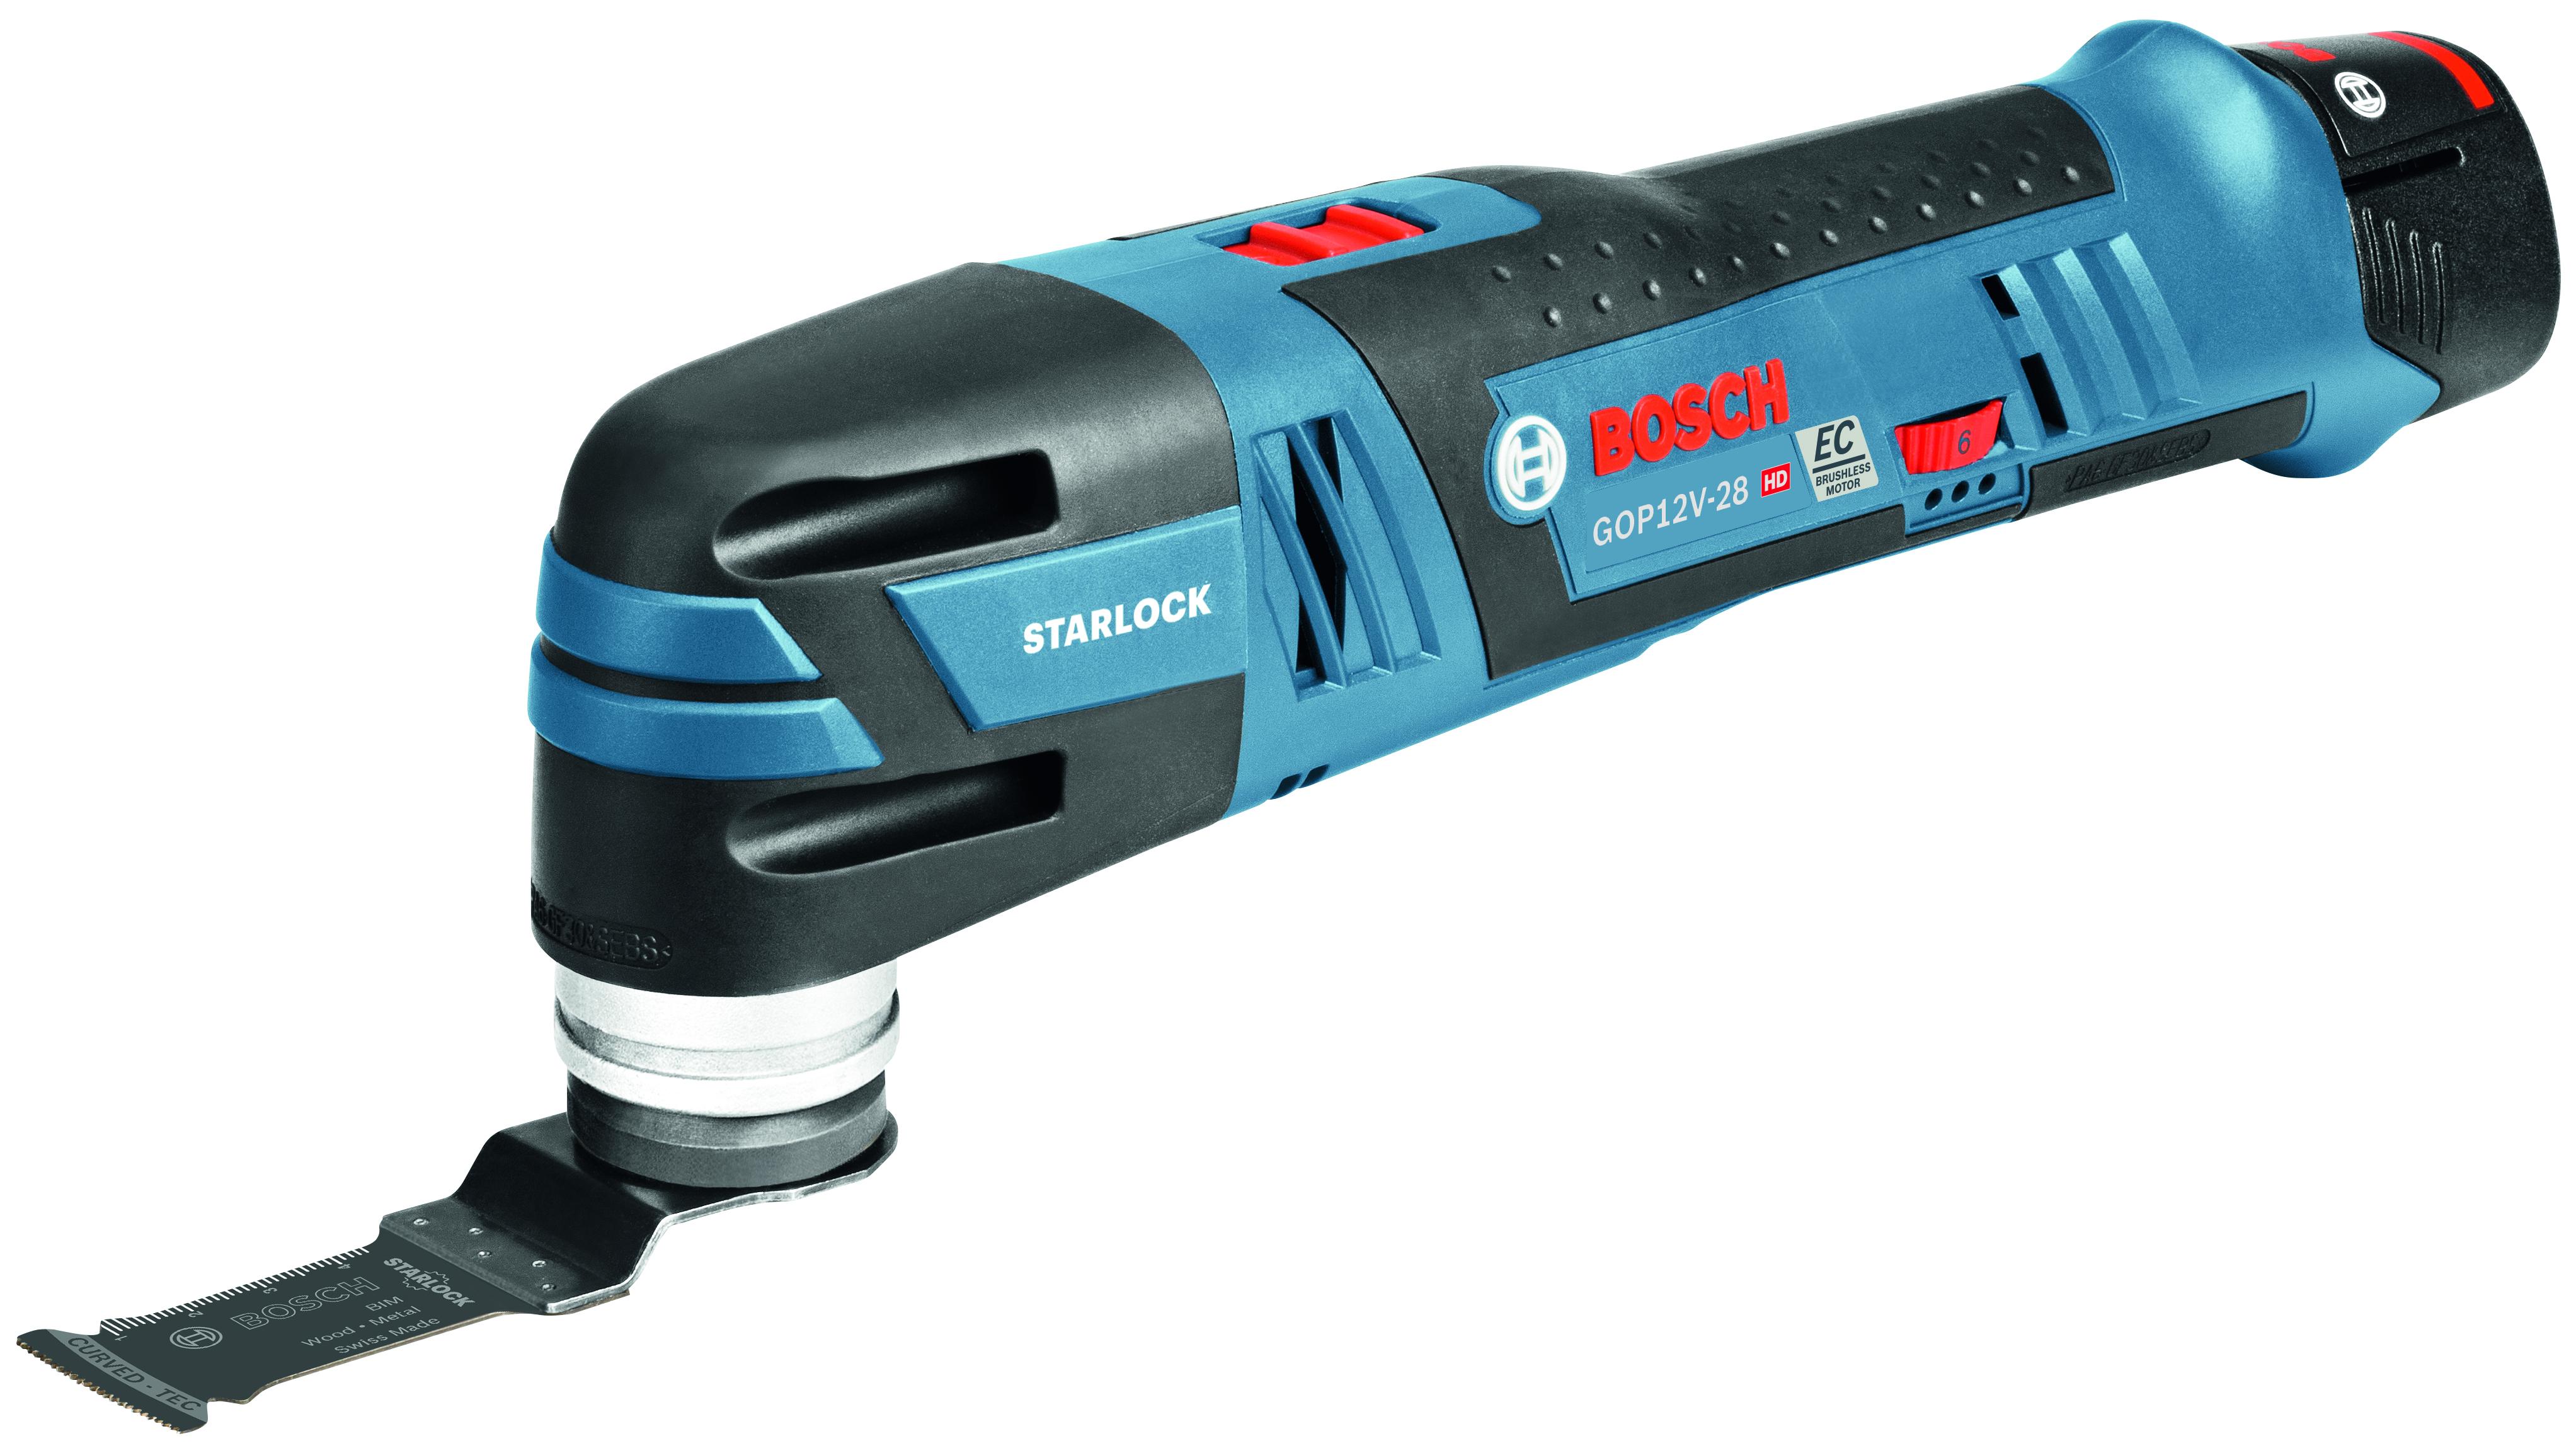 Bosch 12v Max Brushless Starlock Oscillating Multi Tool